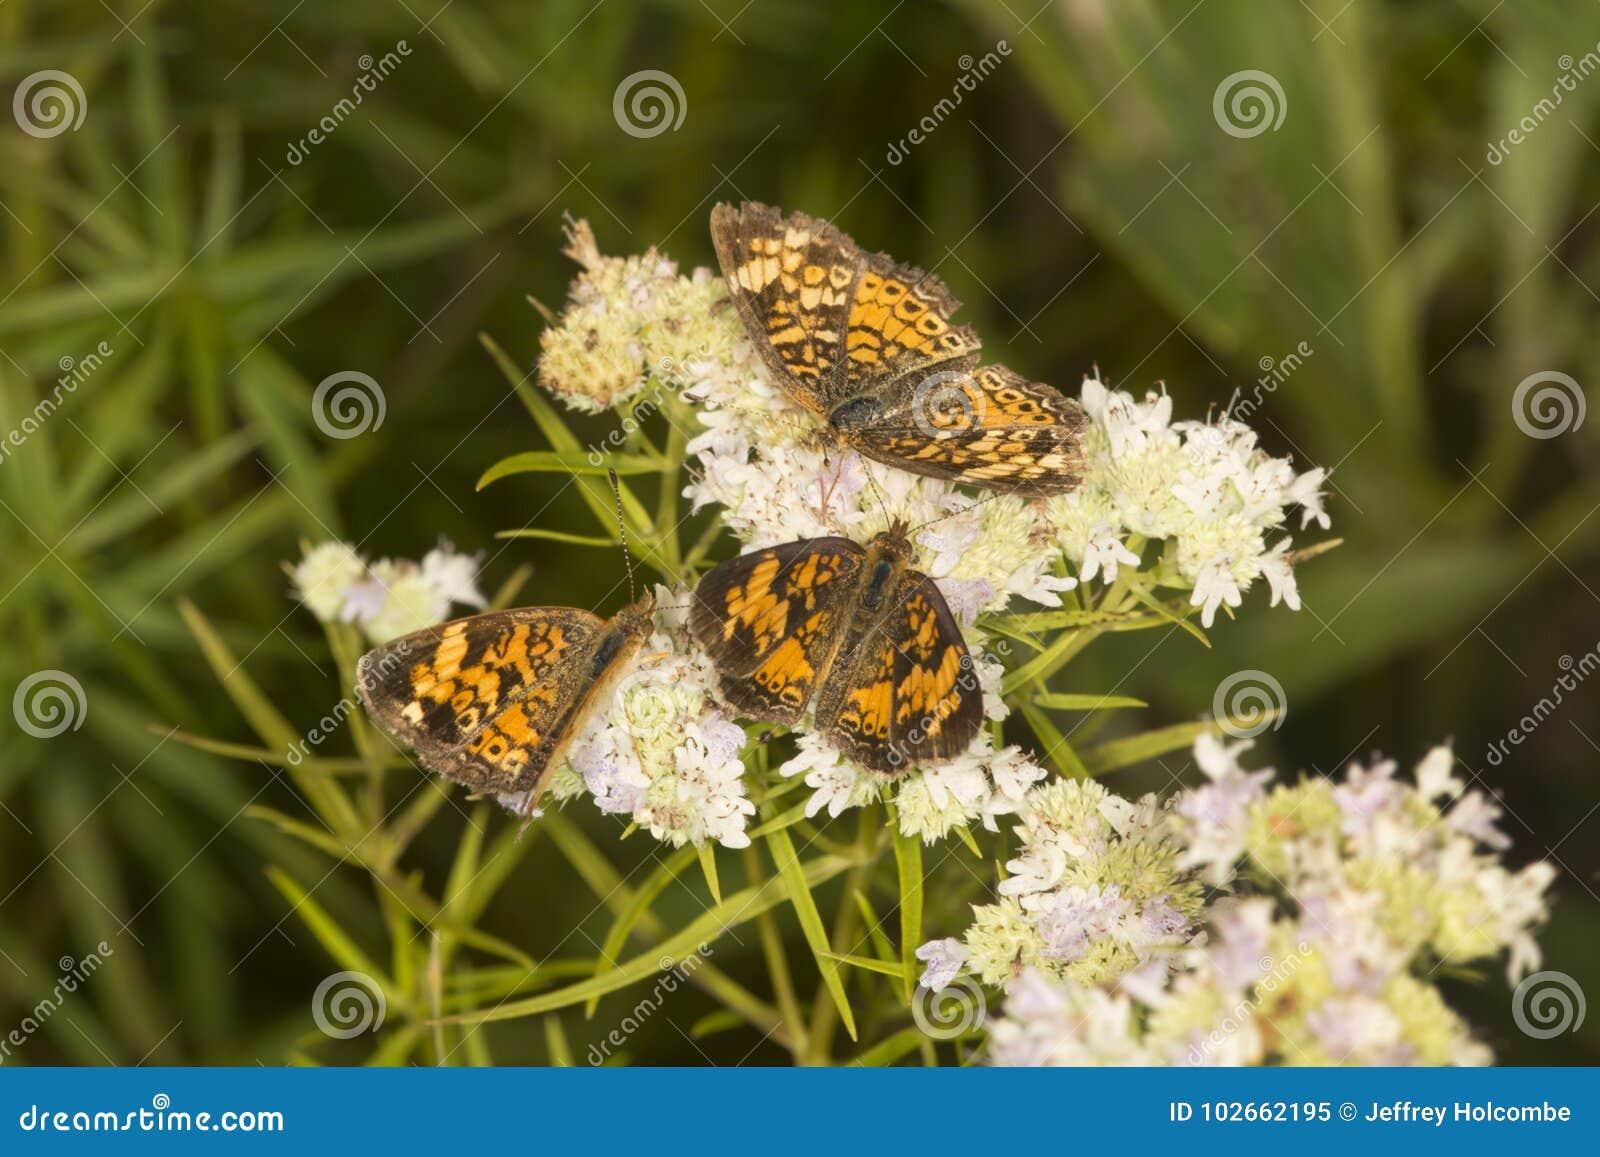 Groep spangled fritillary vlinders op de bloem van de bergmunt